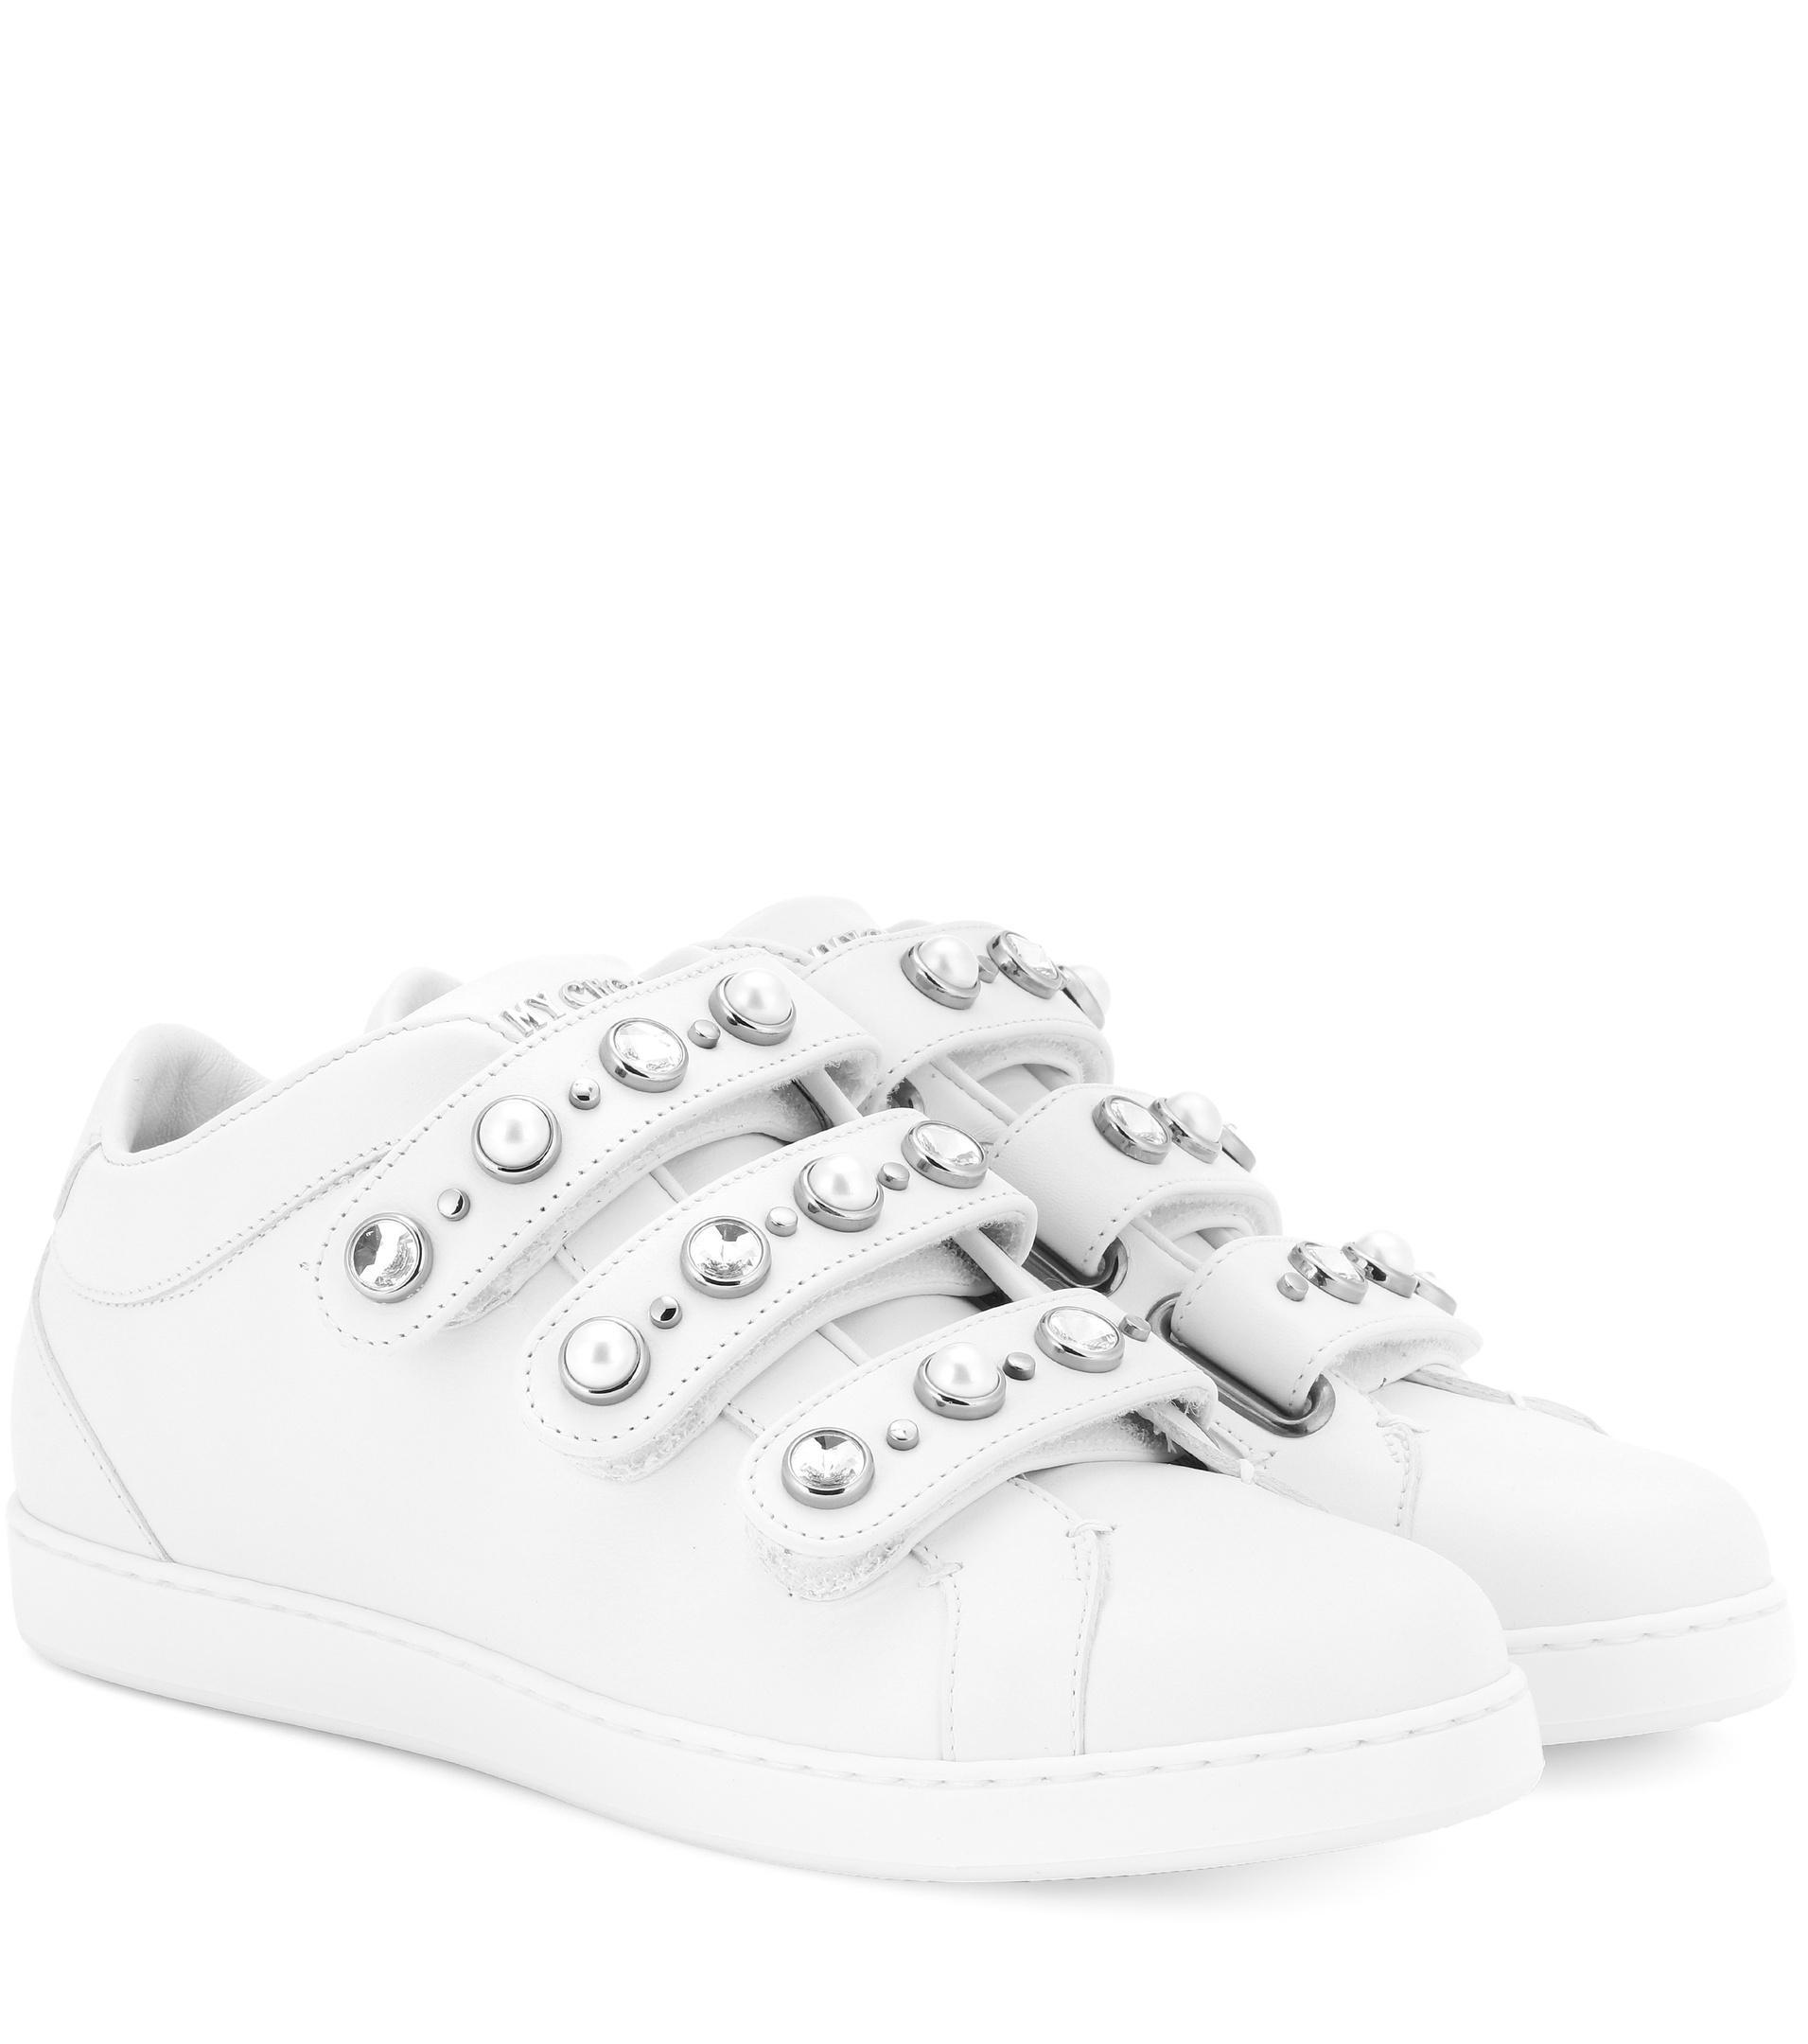 Jimmy Choo NY embellished leather sneakers ebay online RpRH2